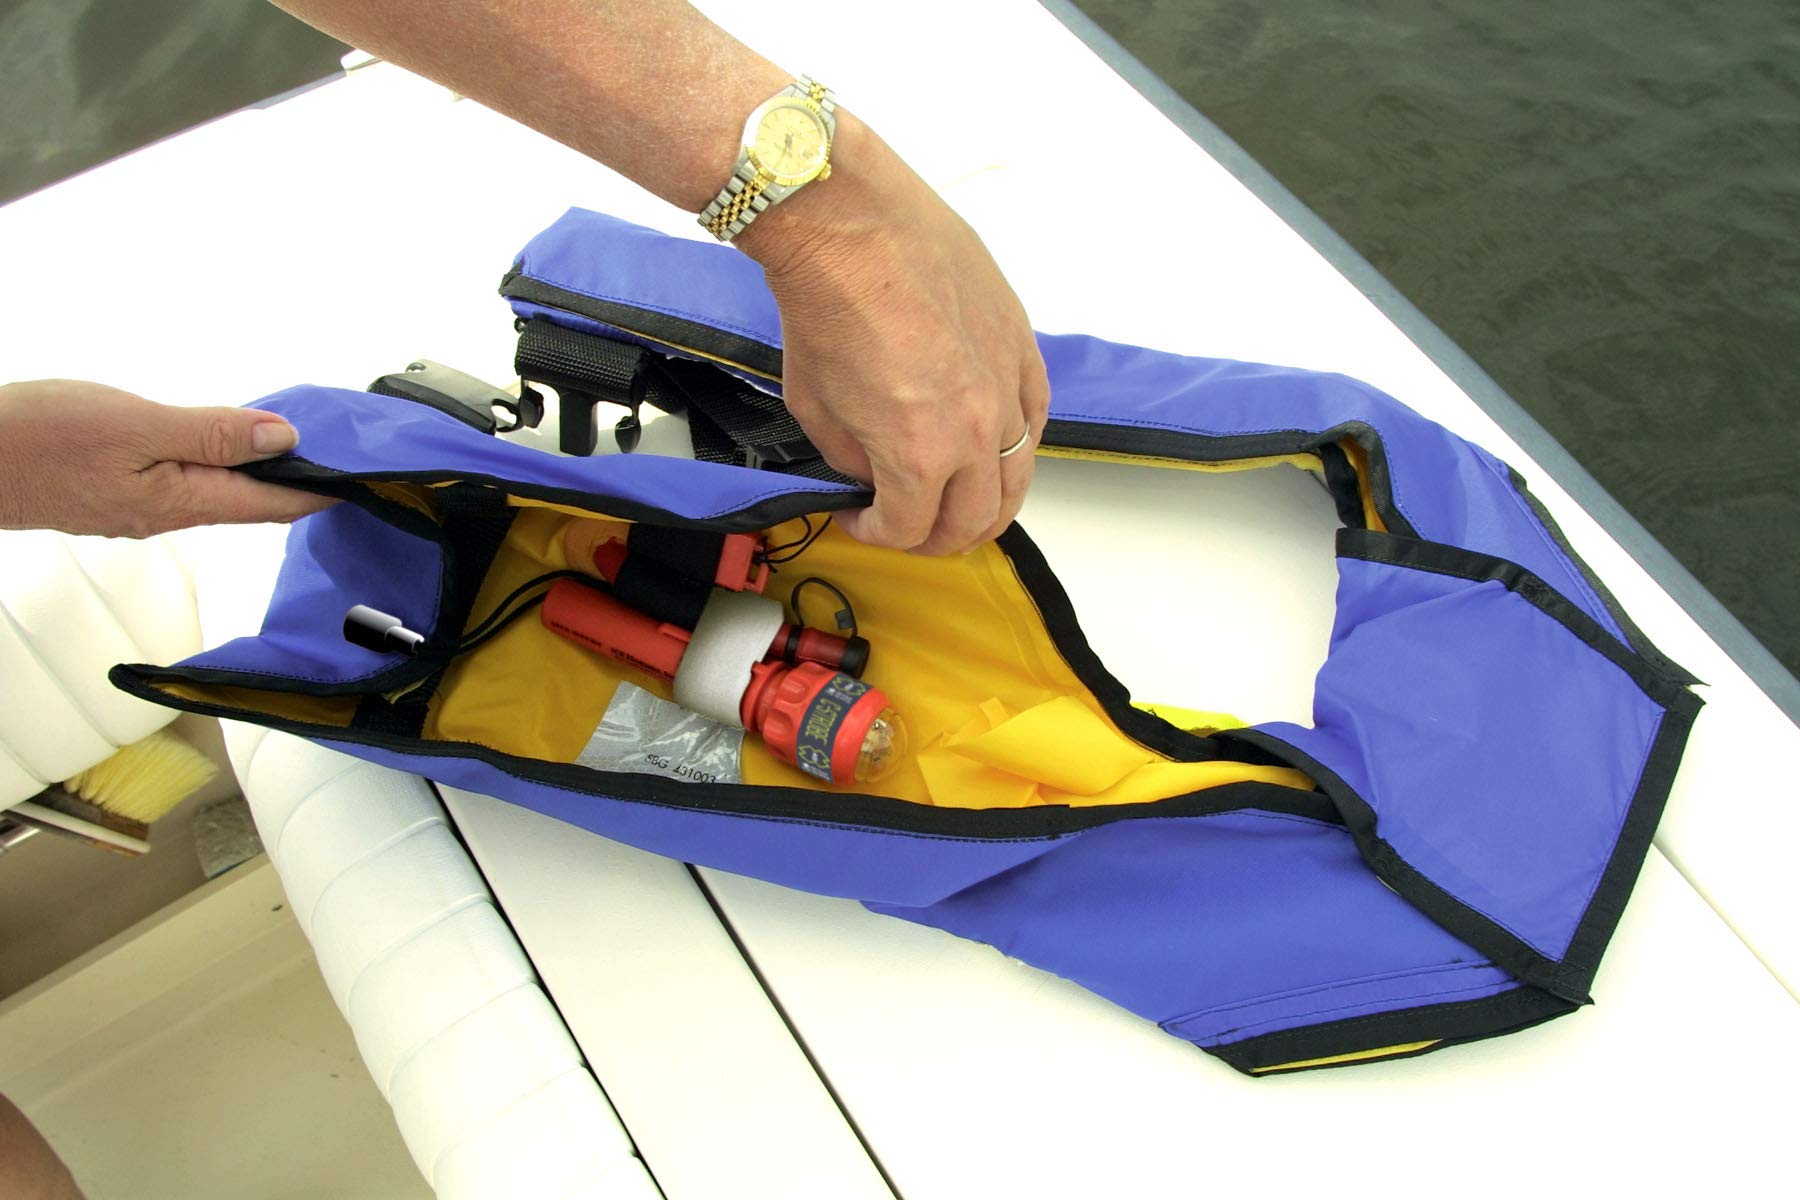 acr C-Strobe Life-Jacket Emergency Signaling Light (3958) (12 Units) by acr